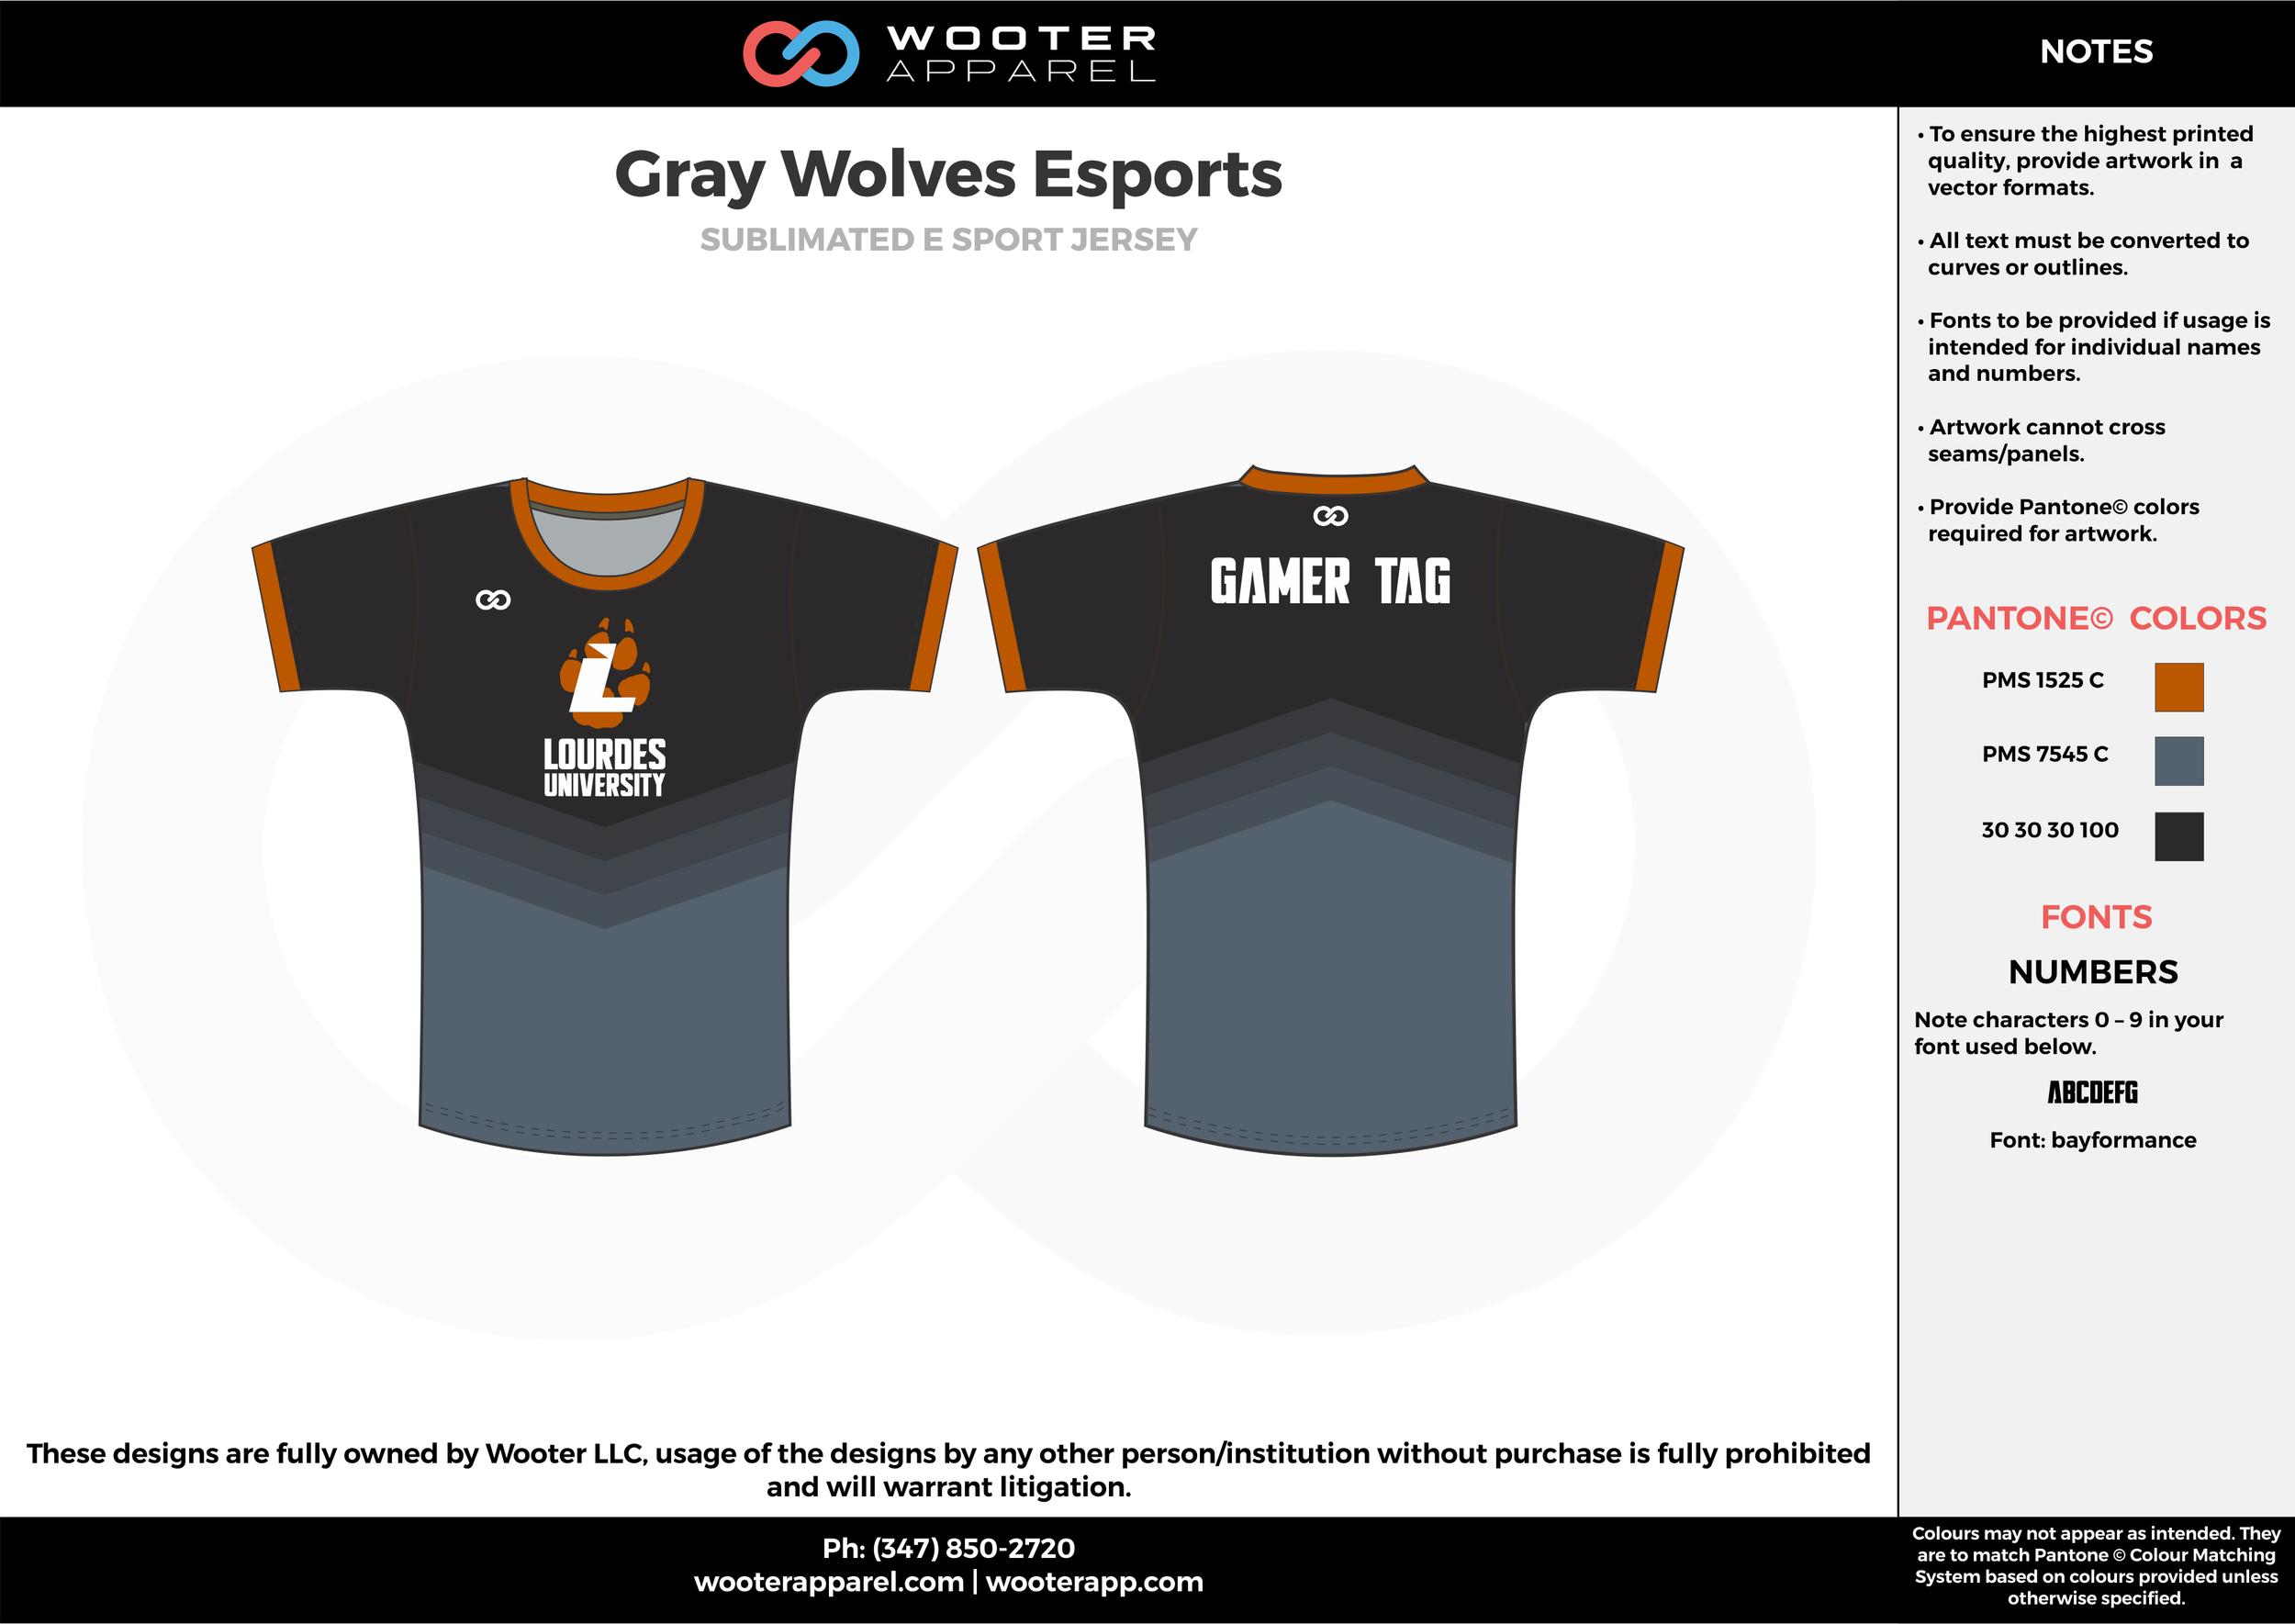 Gray Wolves Esports black gray orange e-sports jerseys, shirts, uniforms